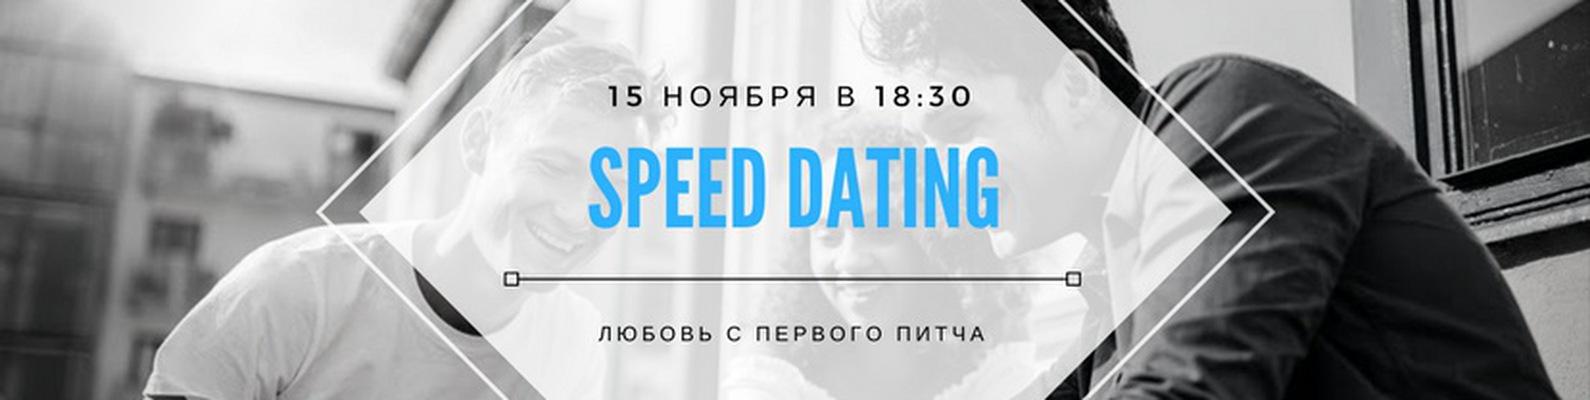 Startup Speed Dating - mfacebookcom